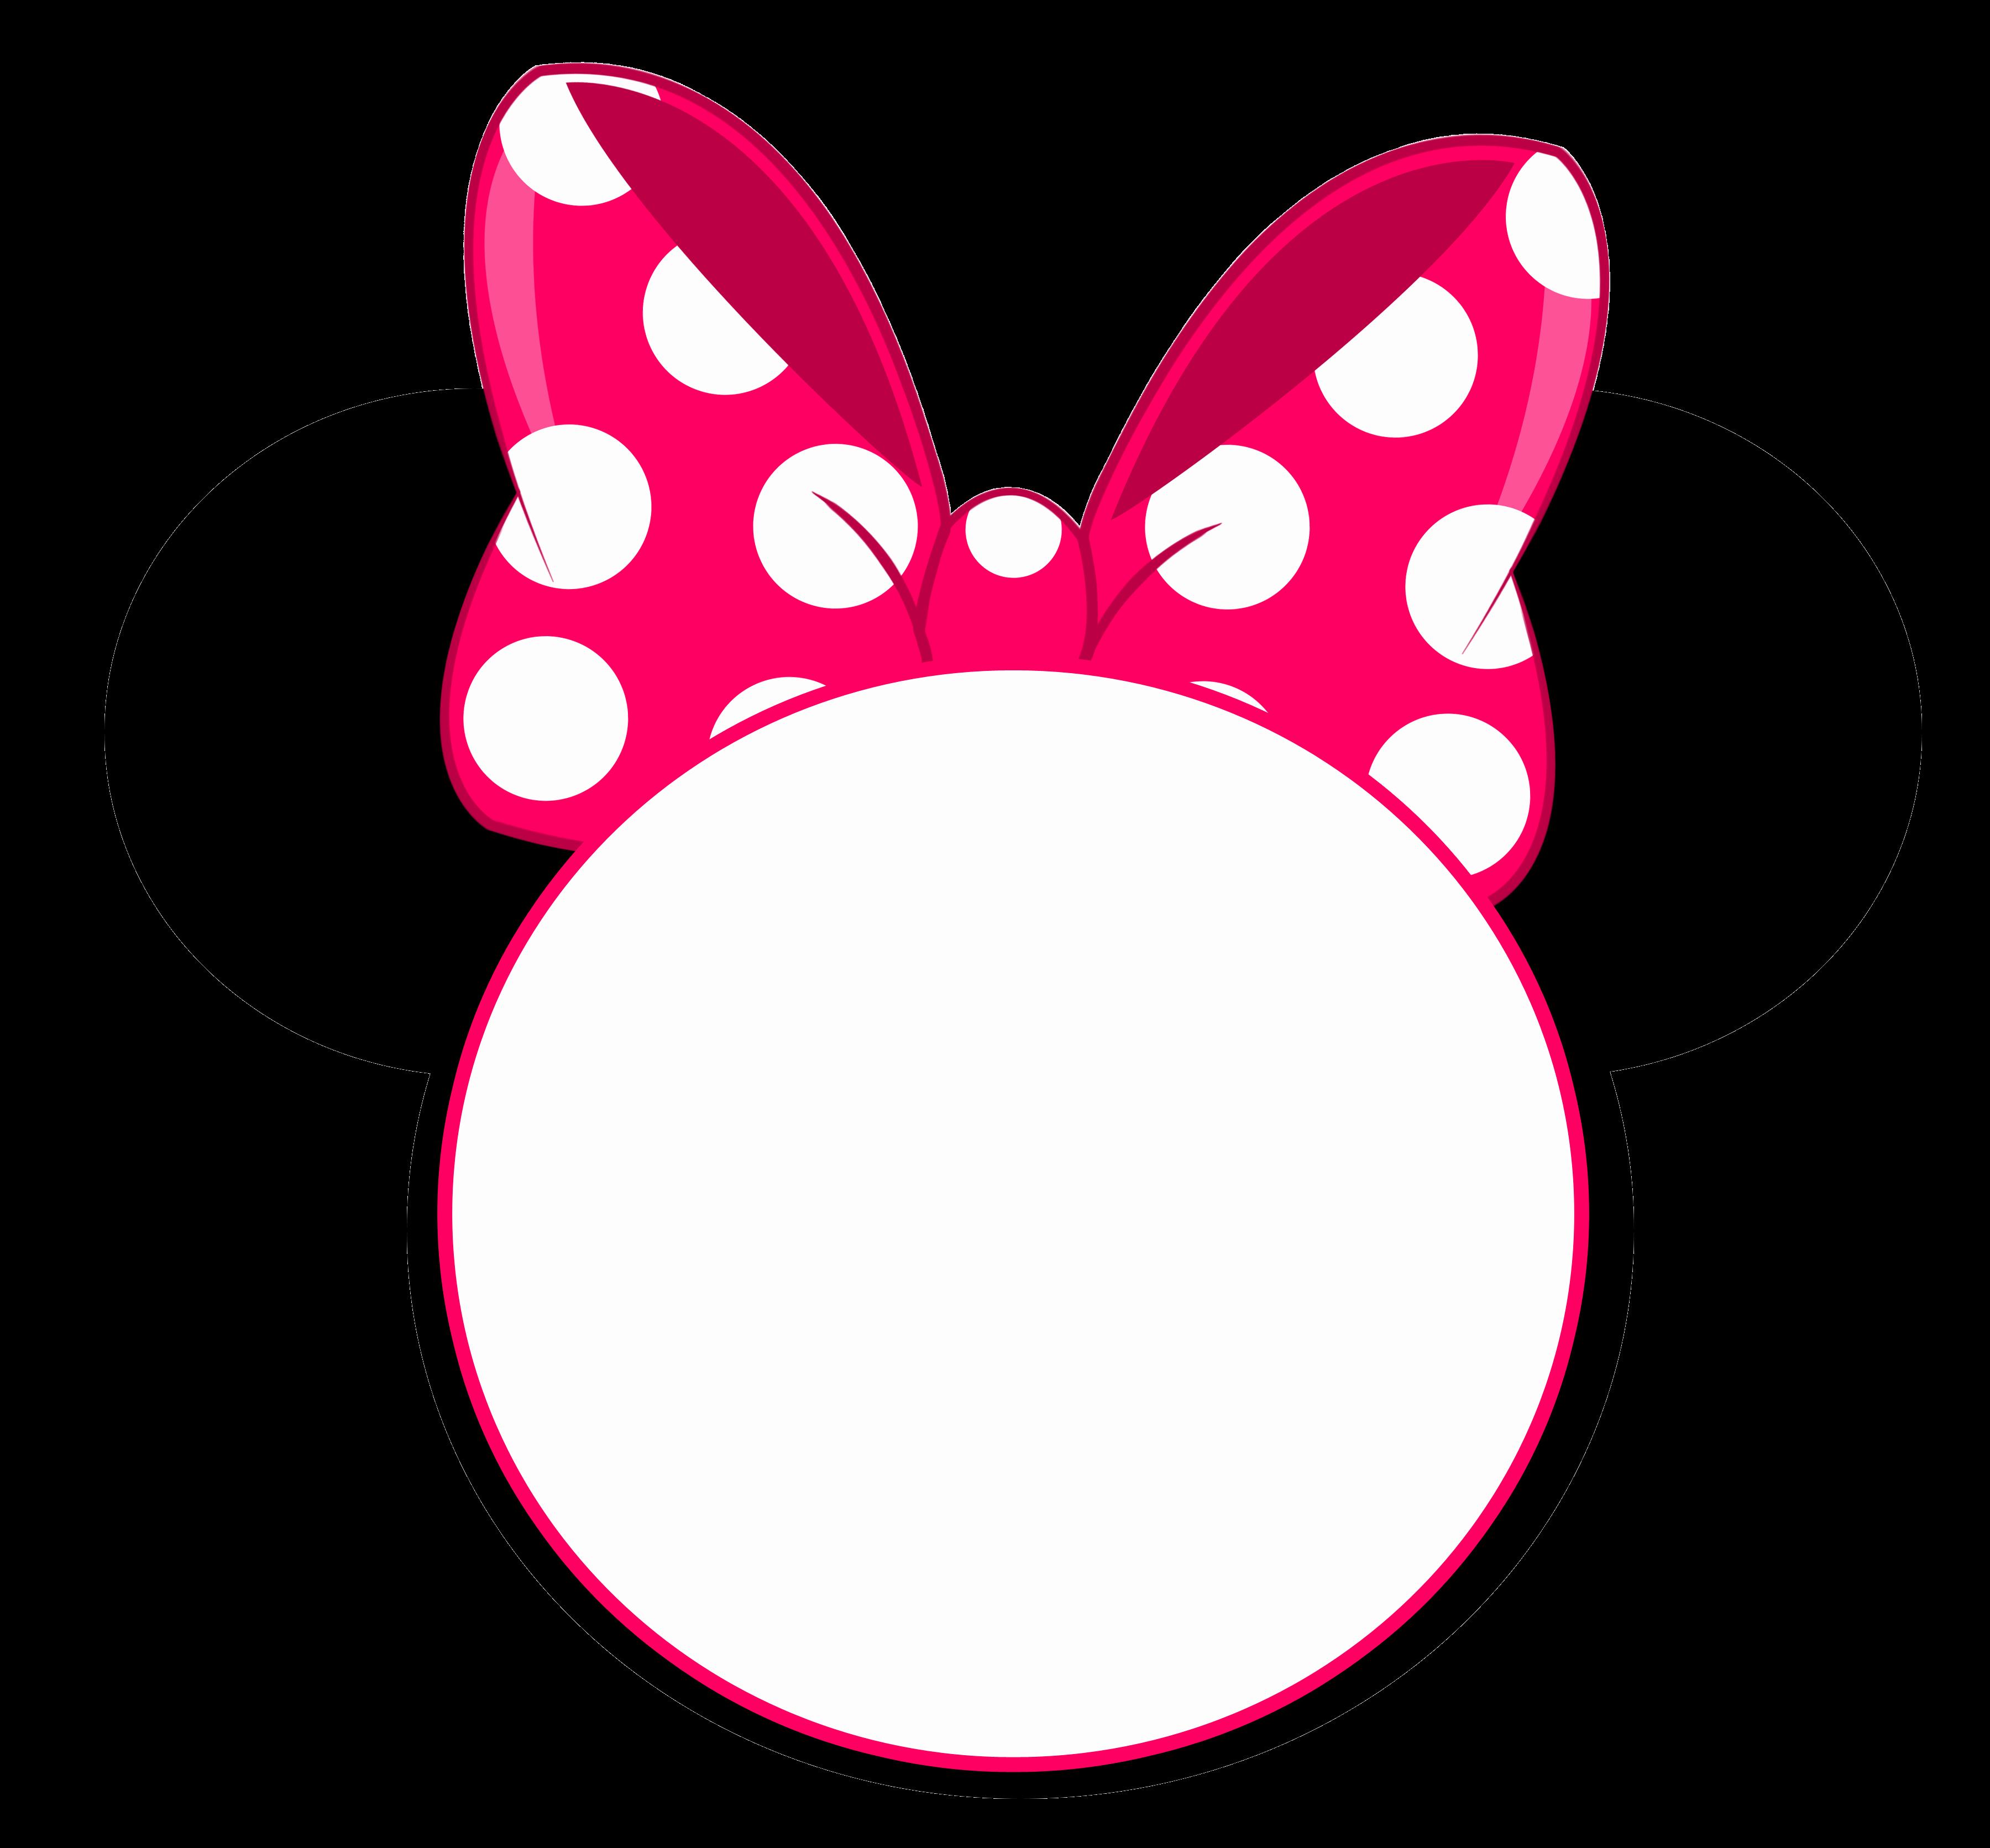 Printable Minnie Mouse Head Unique Free Printable Minnie Mouse Pinky Birthday Invitation